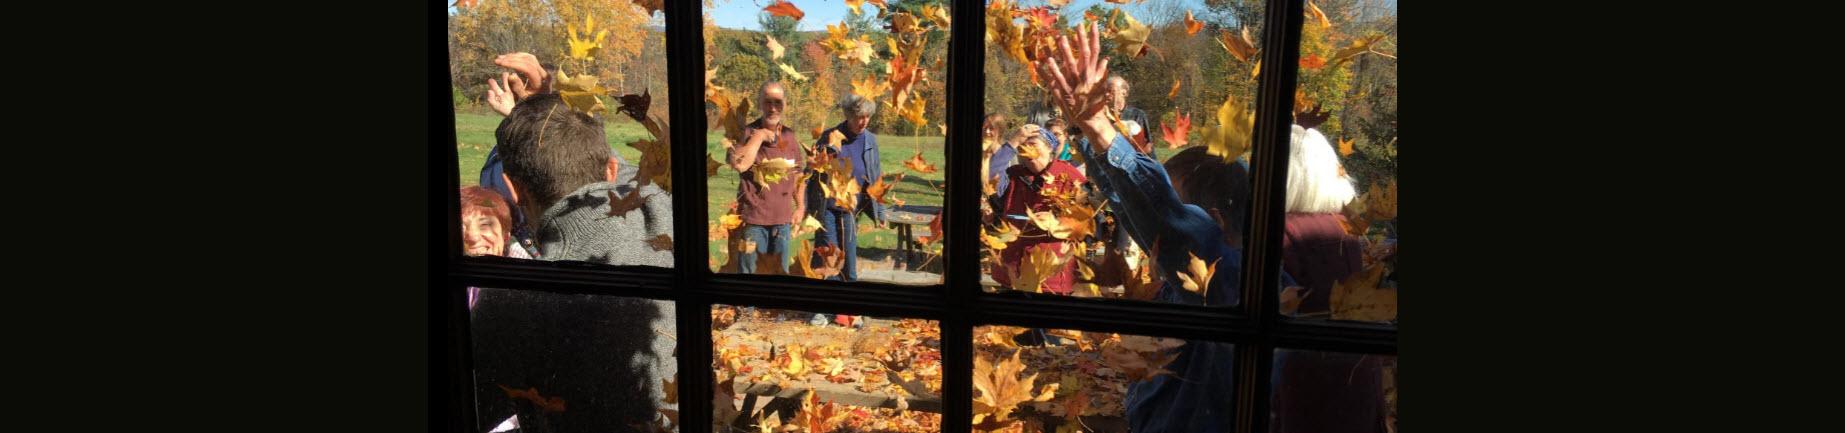 AutumnGathering_slider